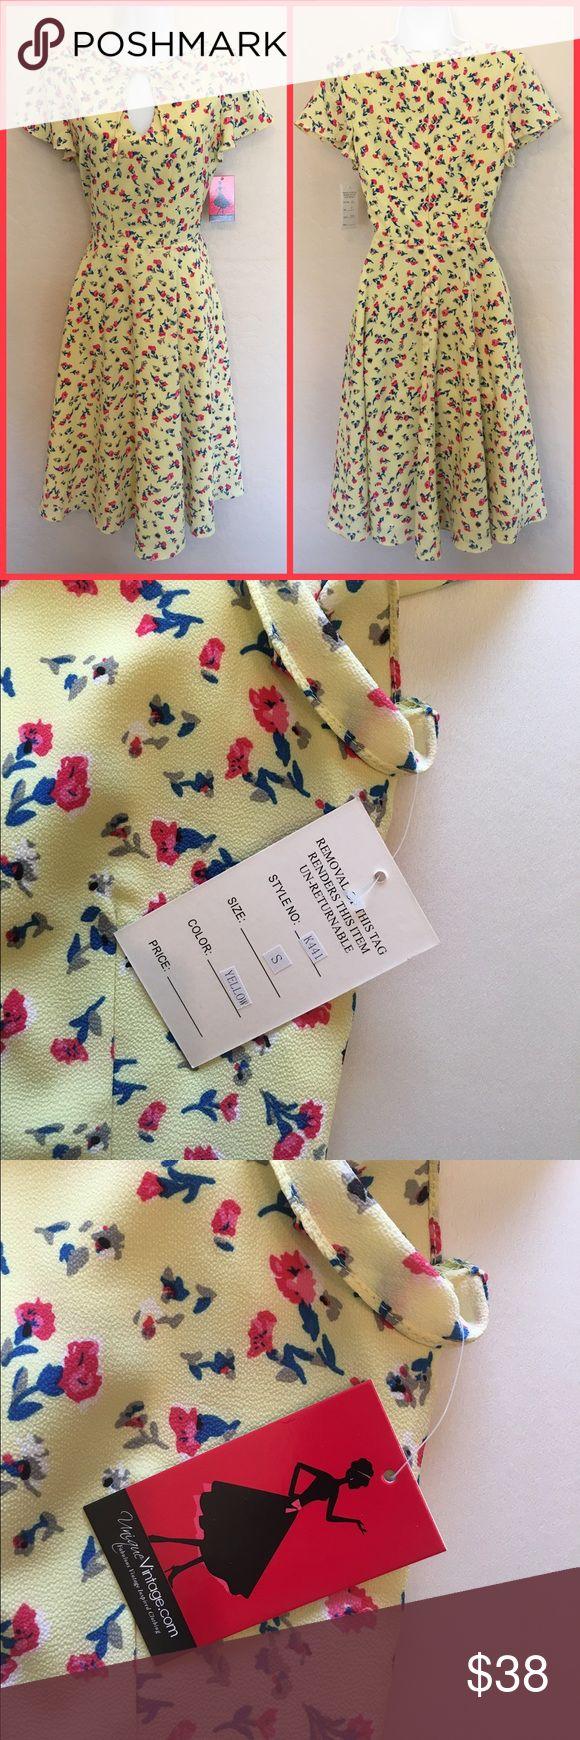 Farouk turbo inch ceramic flat iron p 46 - Unique Vintage Yellow Floral Dress Nwt